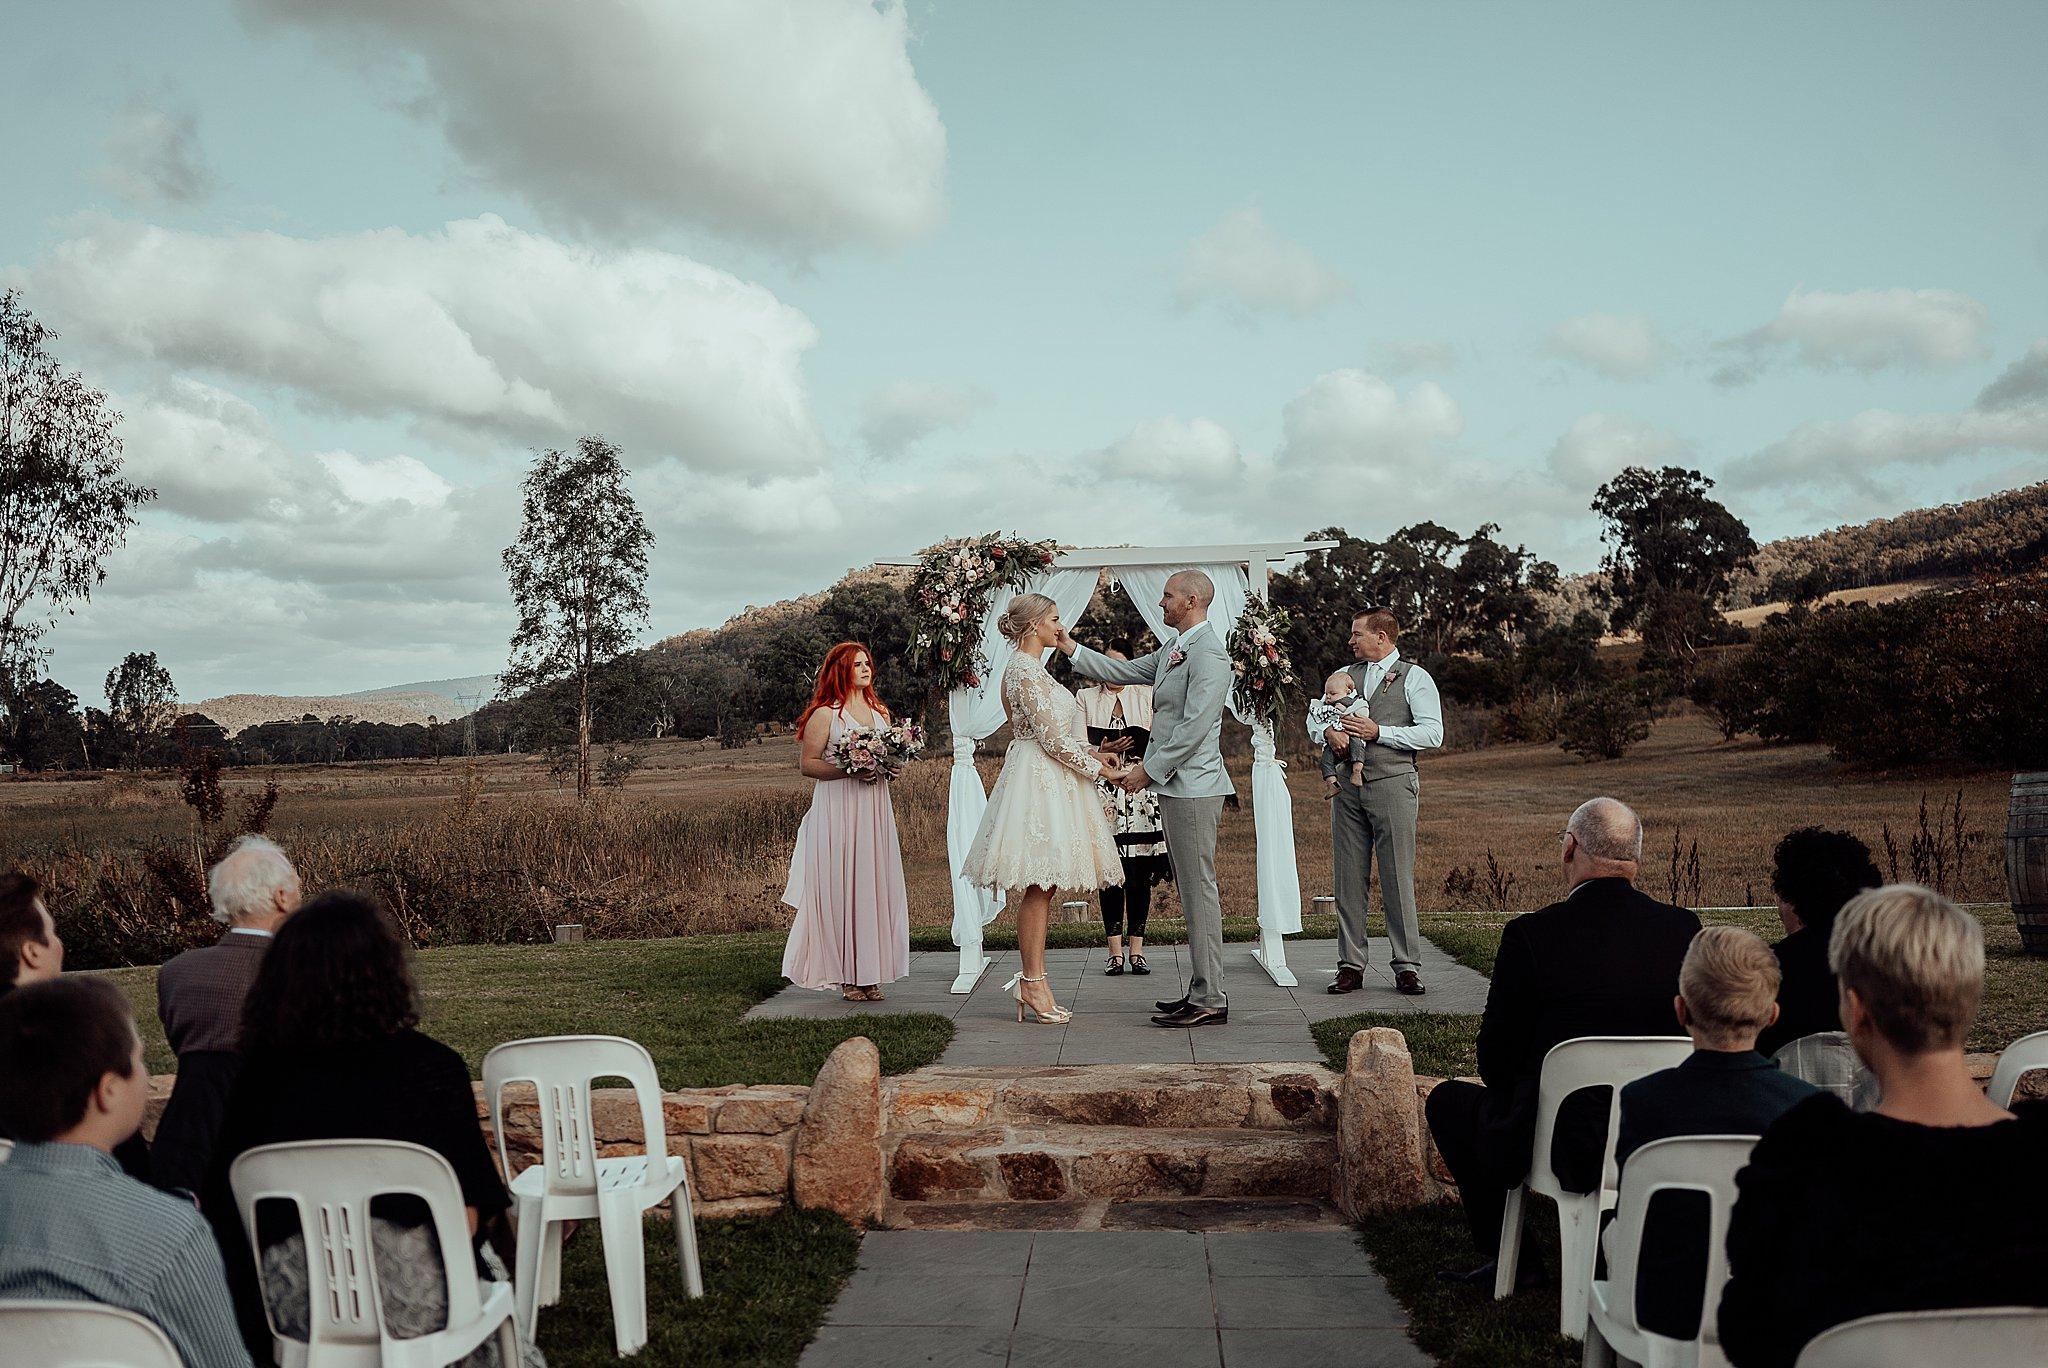 mickalathomas_puremacphotography_weddingphotographer_couplephotographer_Sheppartonphotographer_3429.jpg